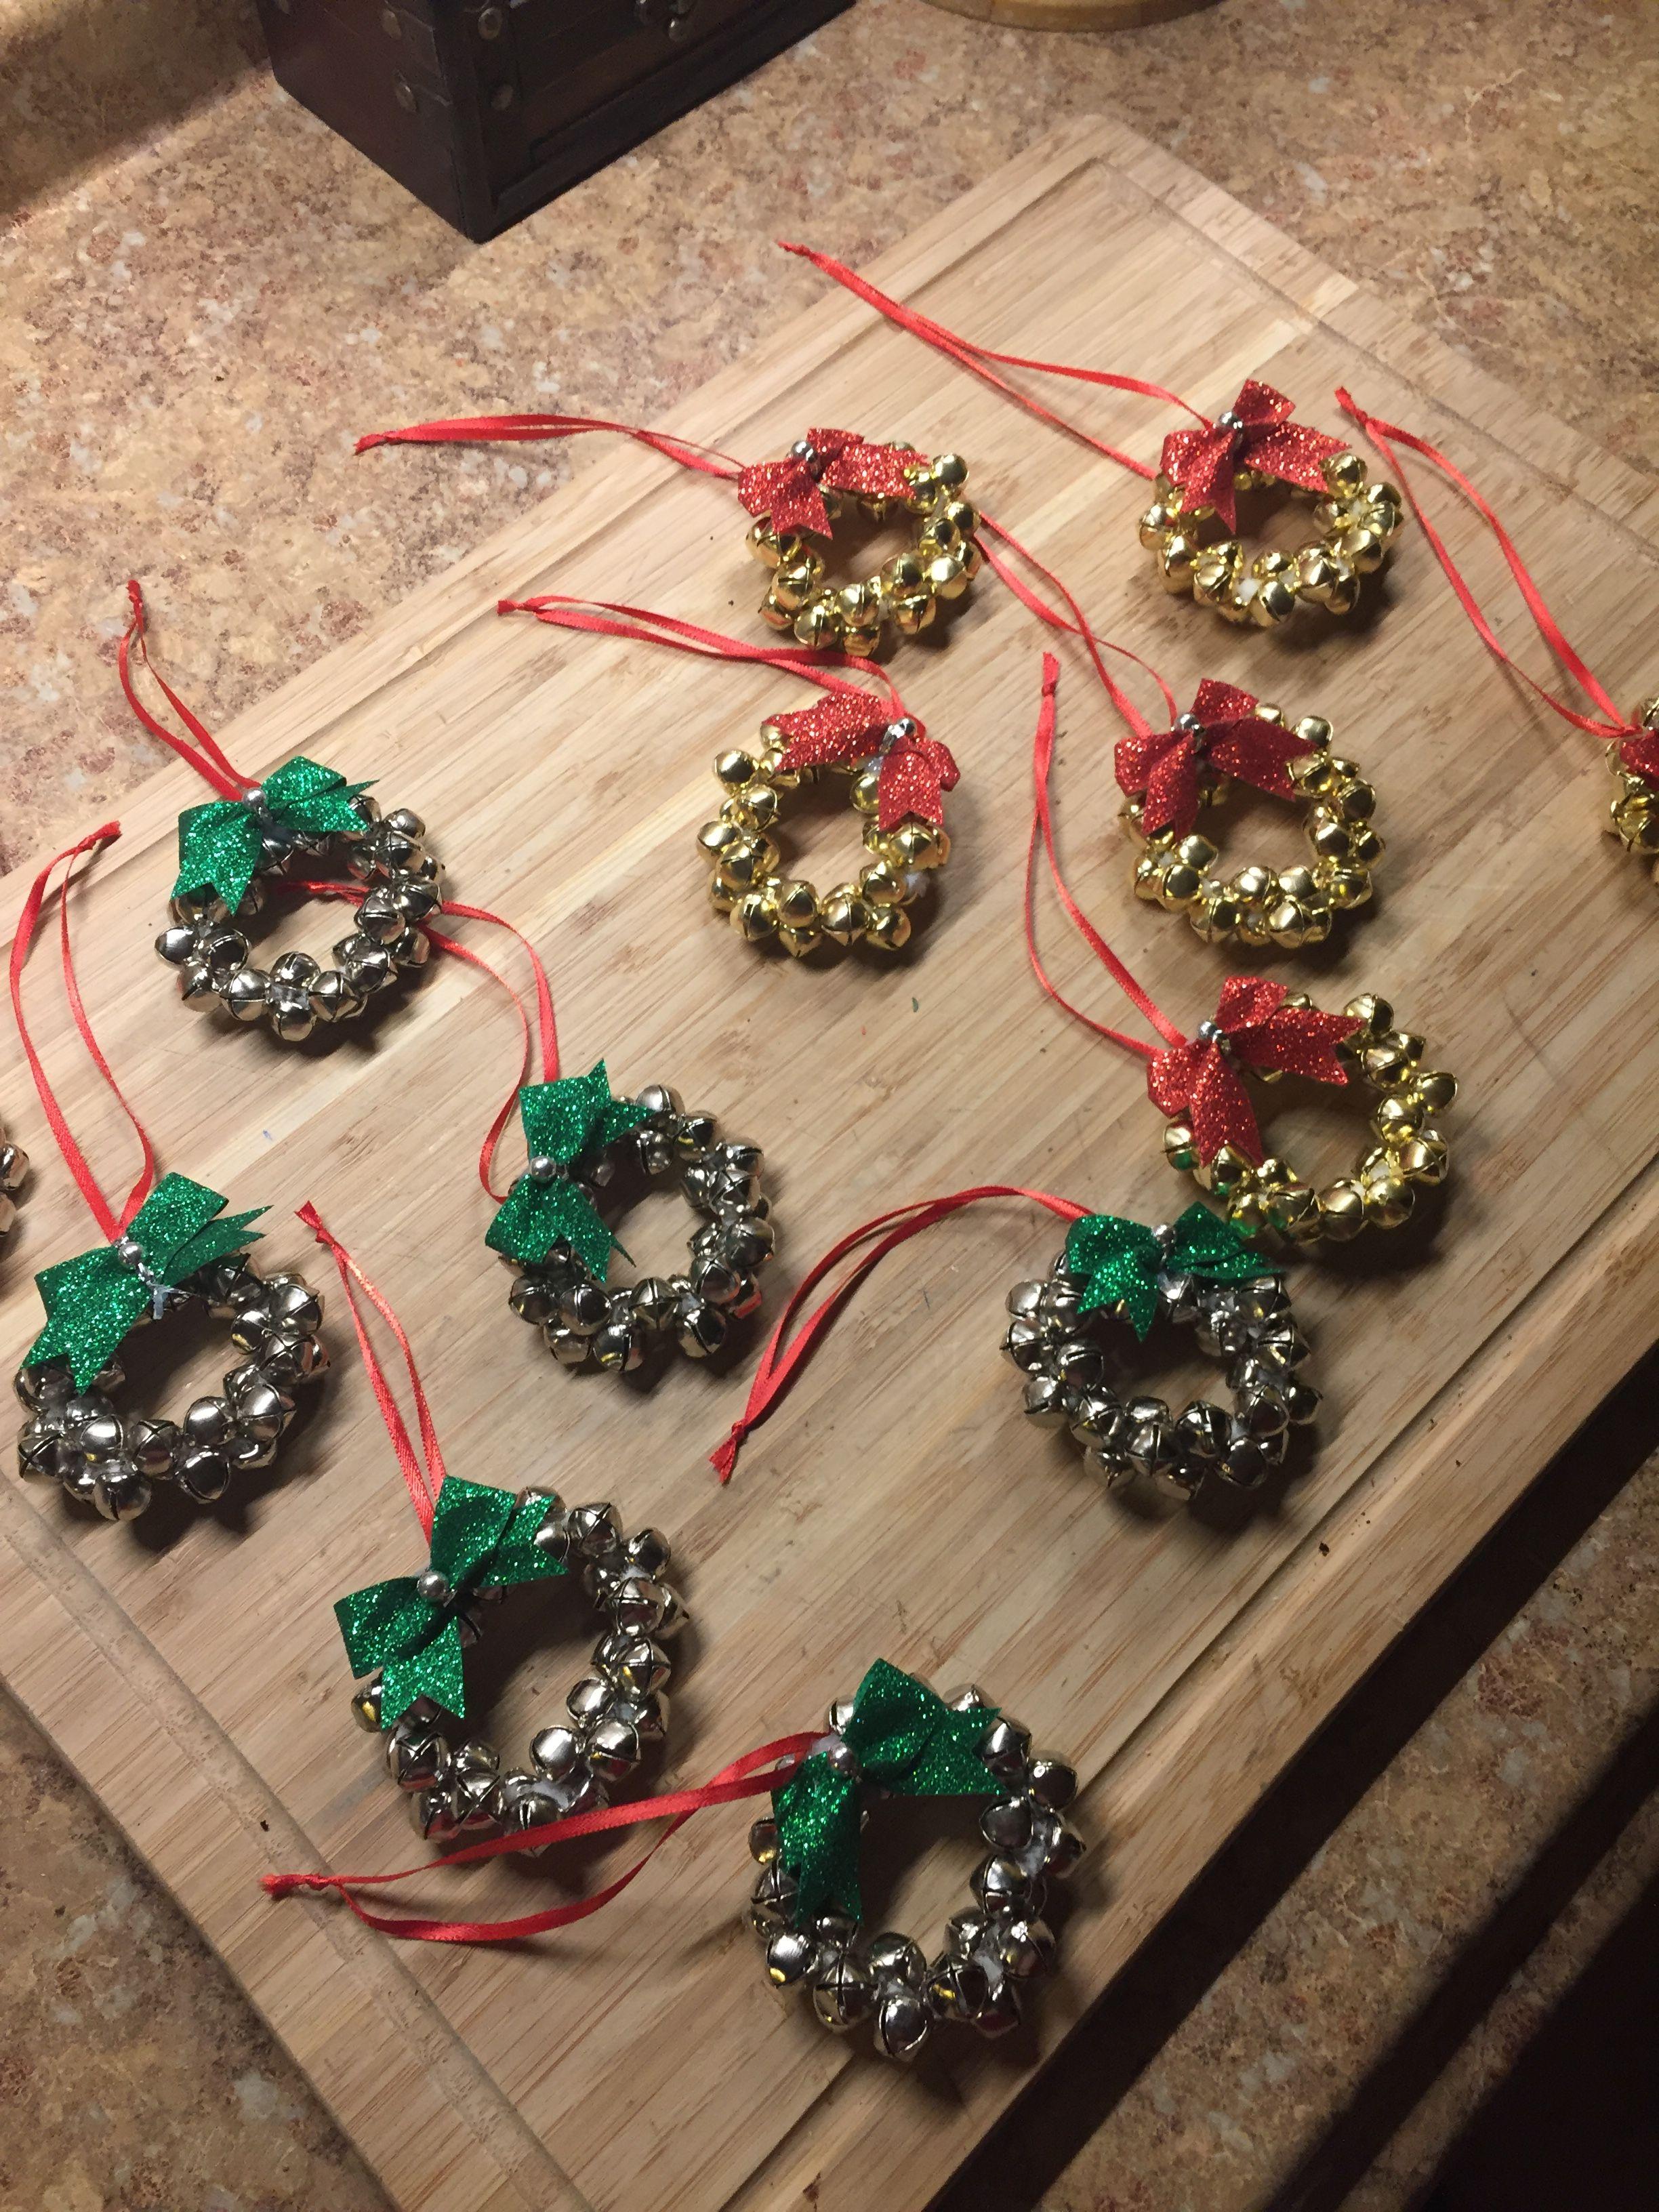 DIY Dollar Tree jingle bell wreath ornaments. Ornament